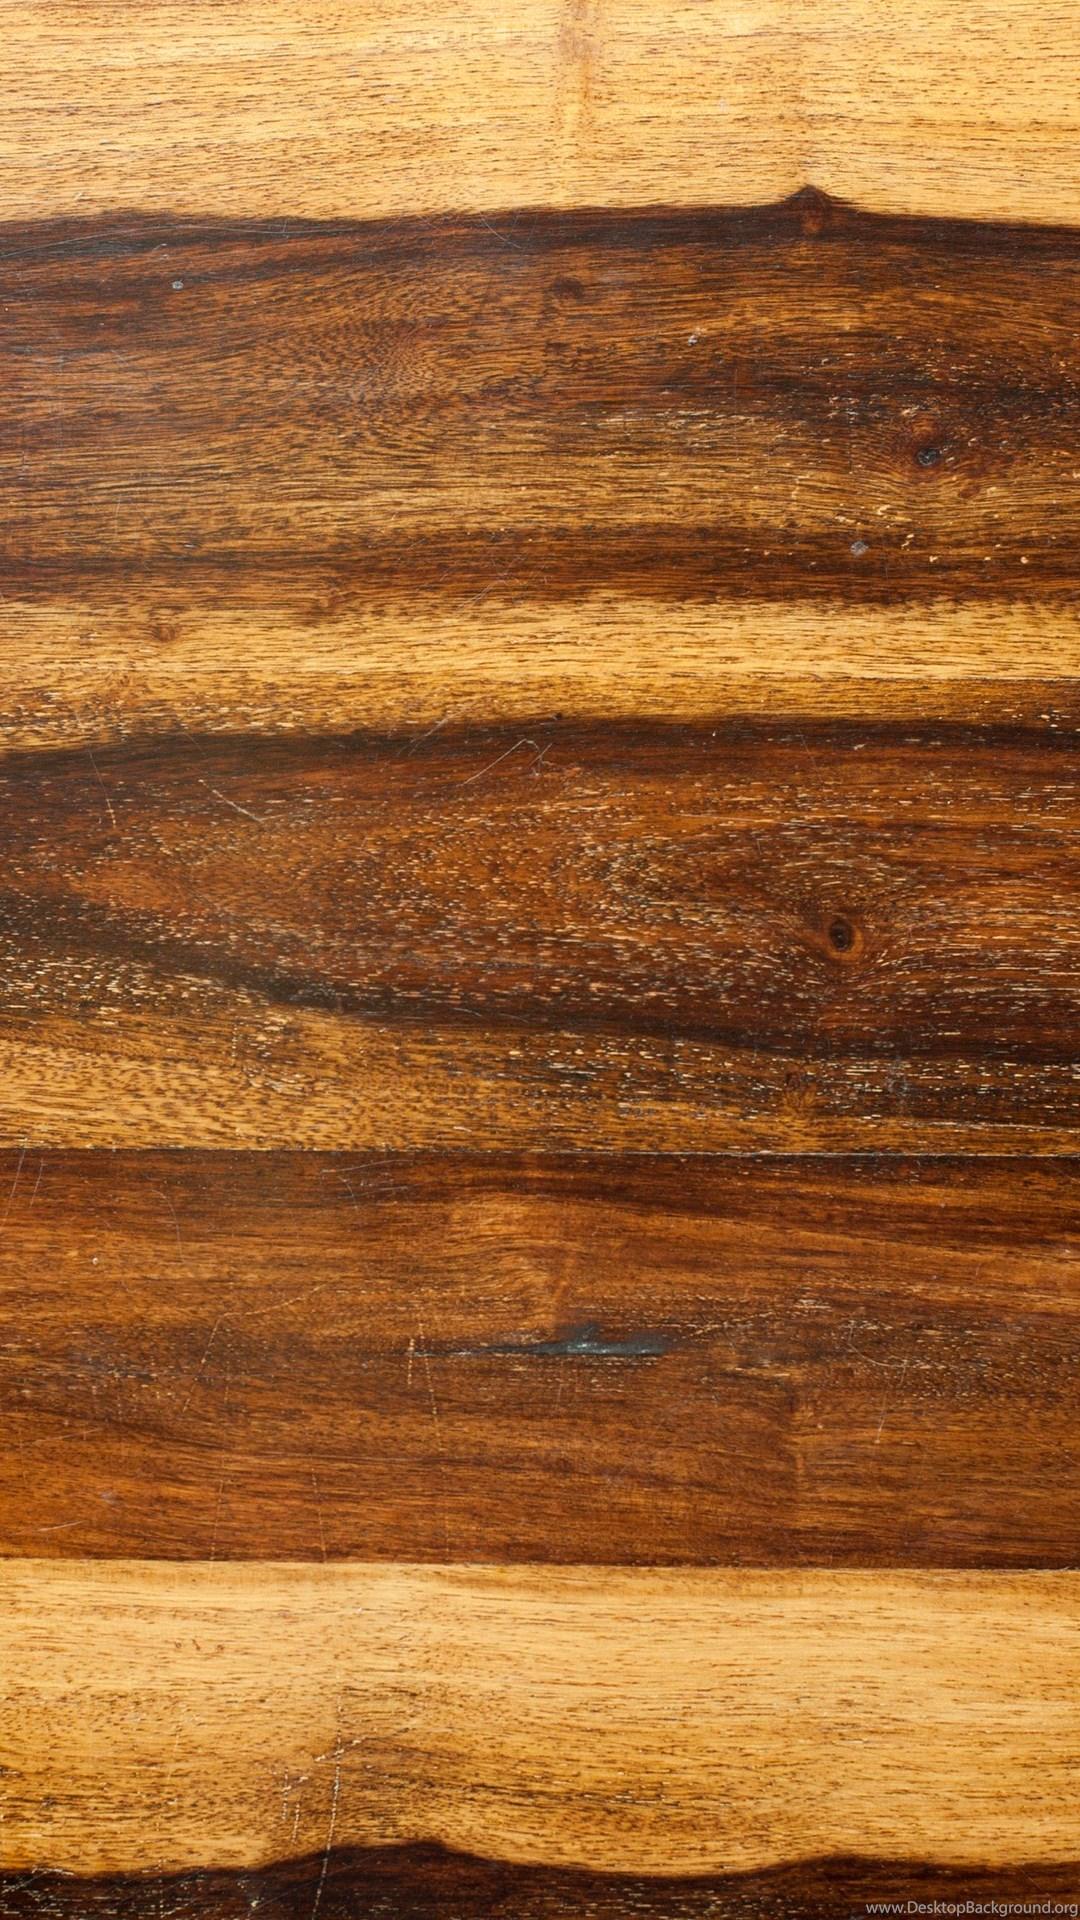 Pretty Mdf Wood Grain Wall Panel For Wood Grain Desktop Background